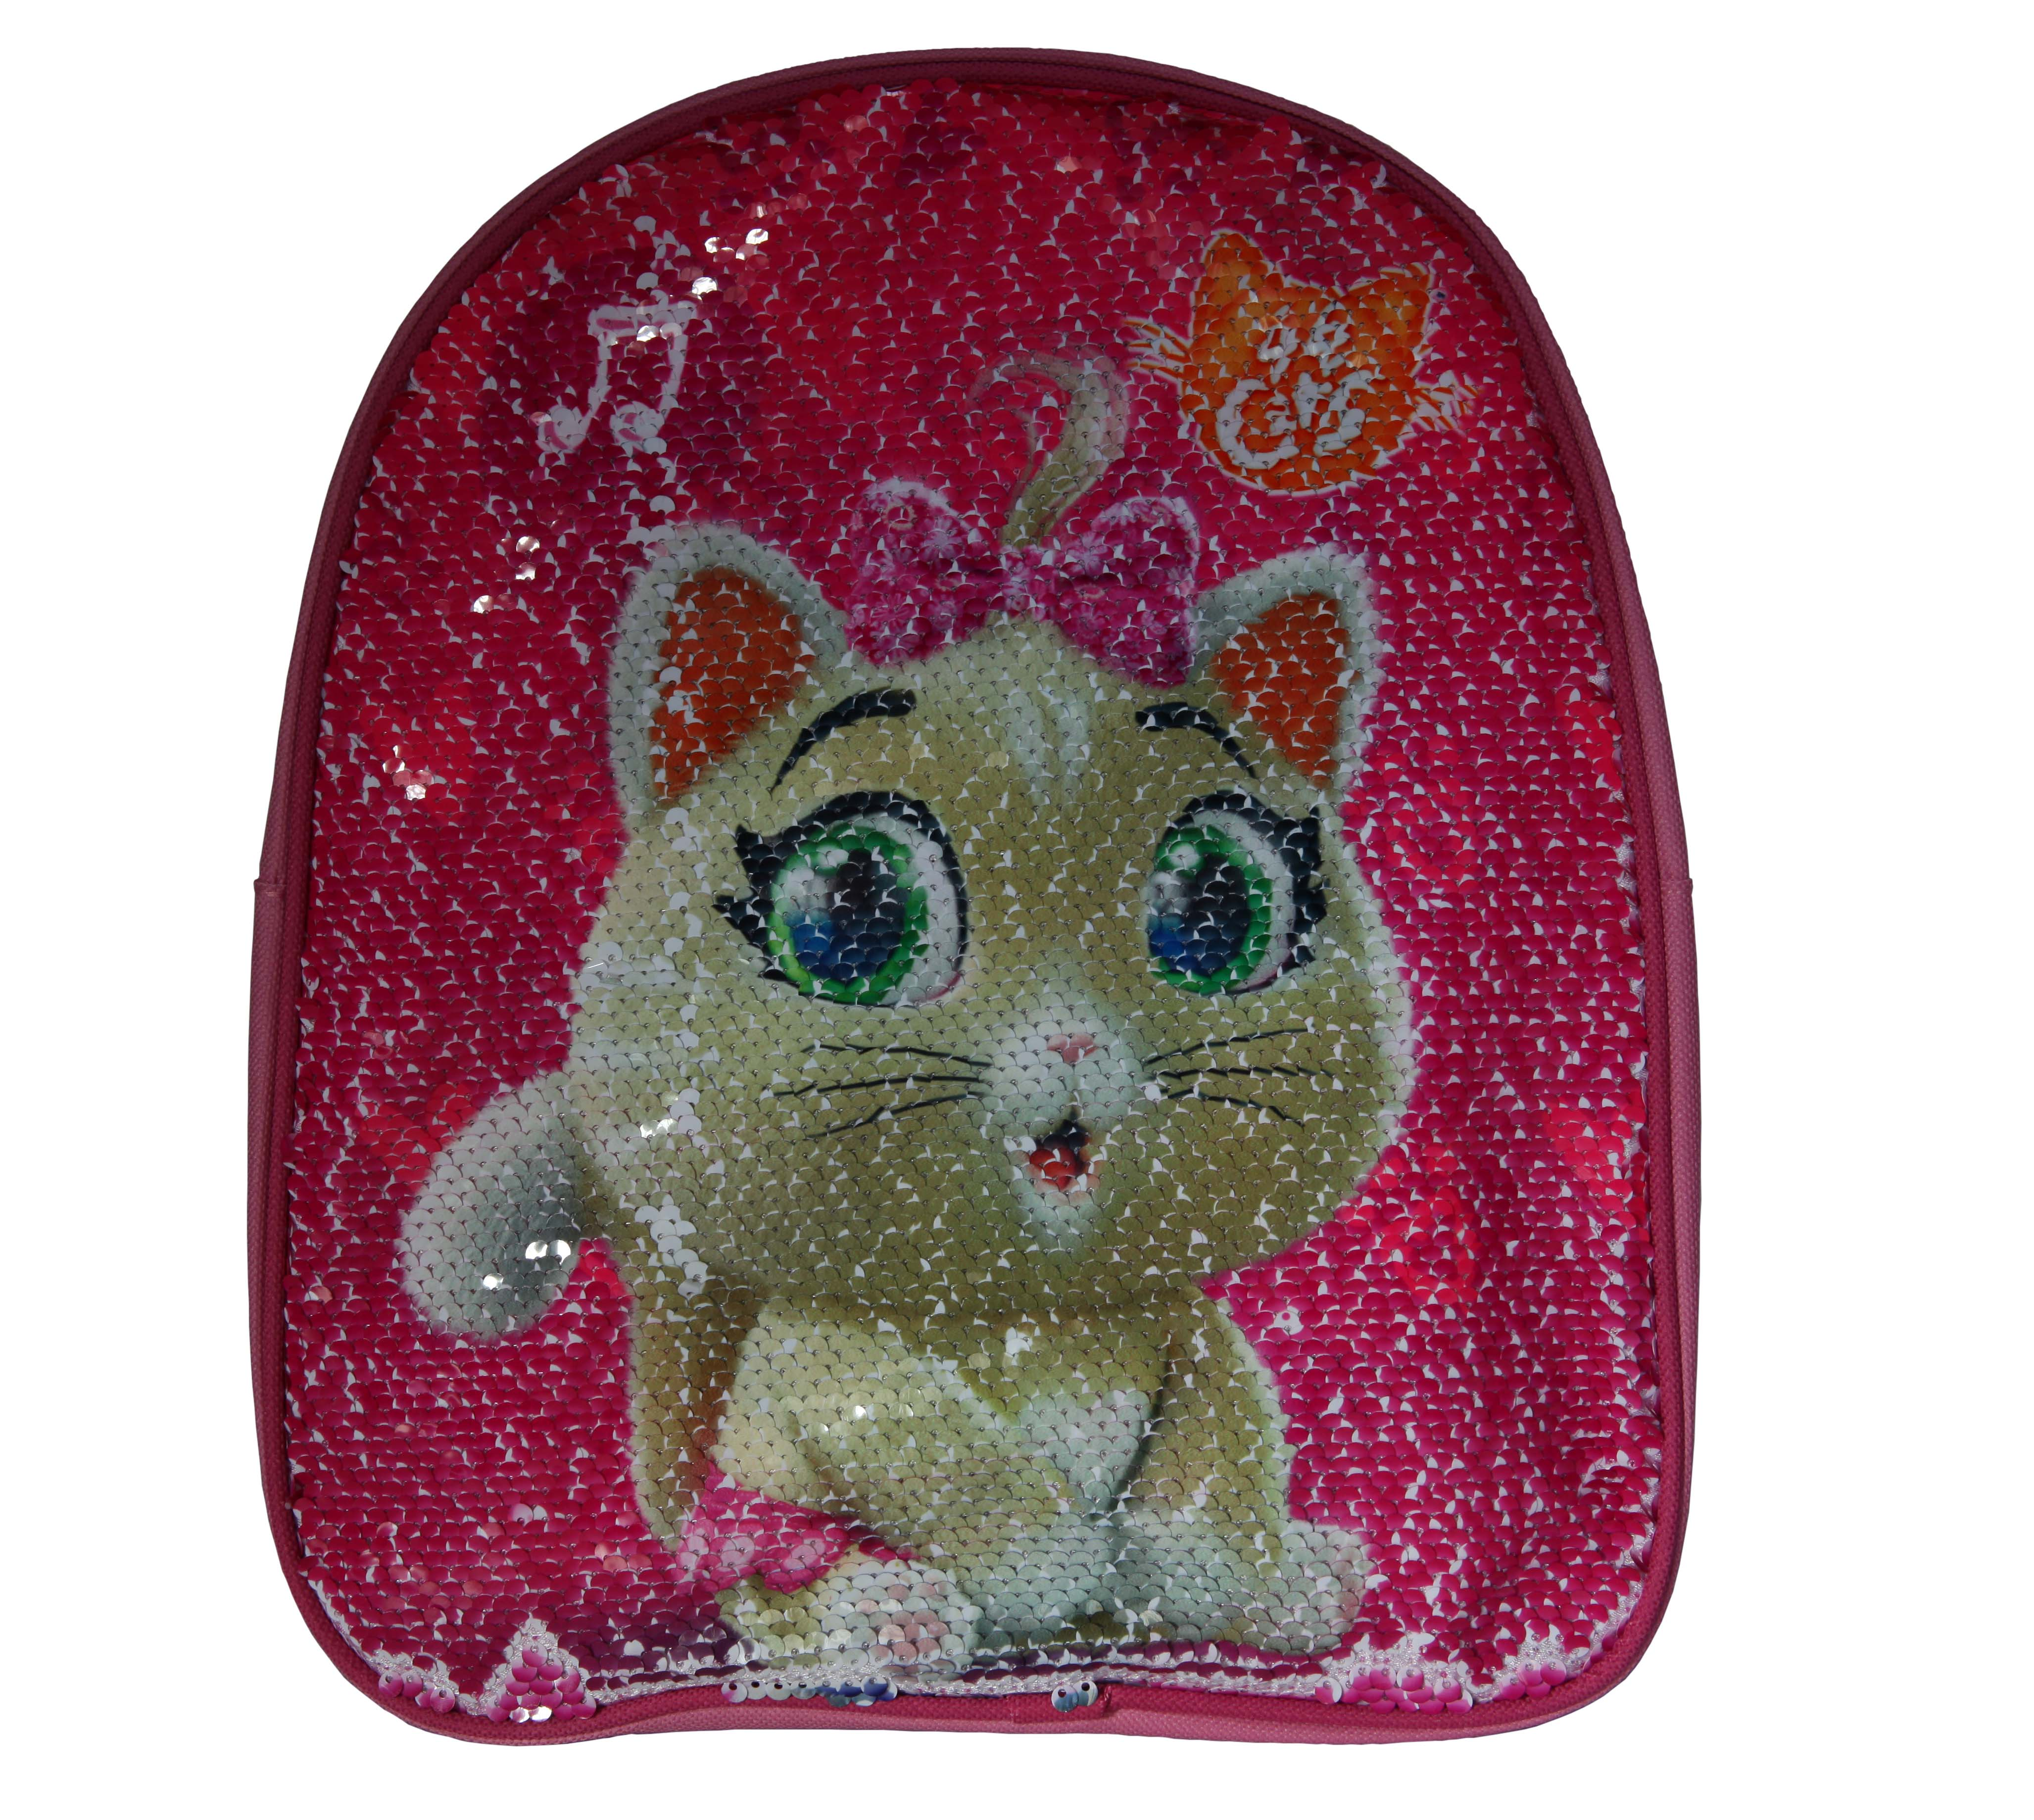 Ghiozdan gradinita cu paiete reversibile 44 Cats, roz 30x26x10 cm 0